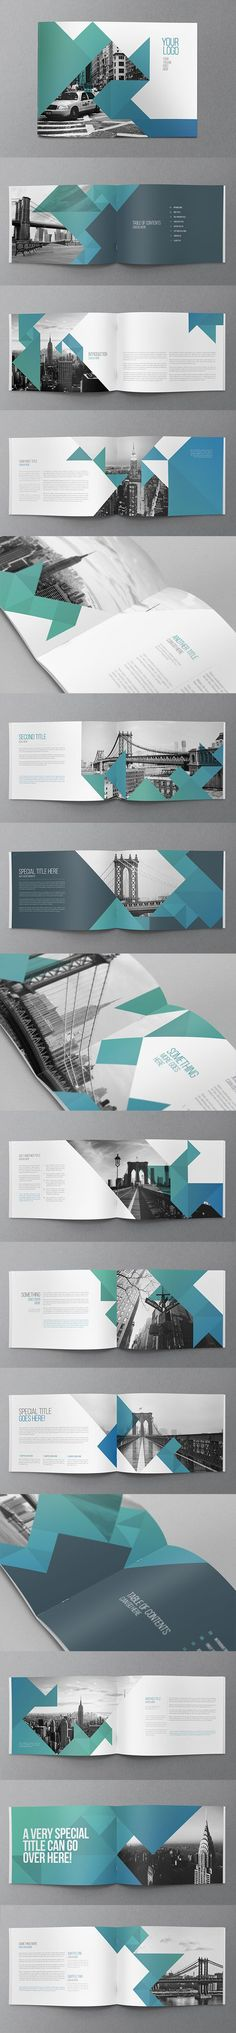 Cool Modern Brochure. Download here: http://graphicriver.net/item/cool-modern-brochure/11532759?ref=abradesign #design #brochure: